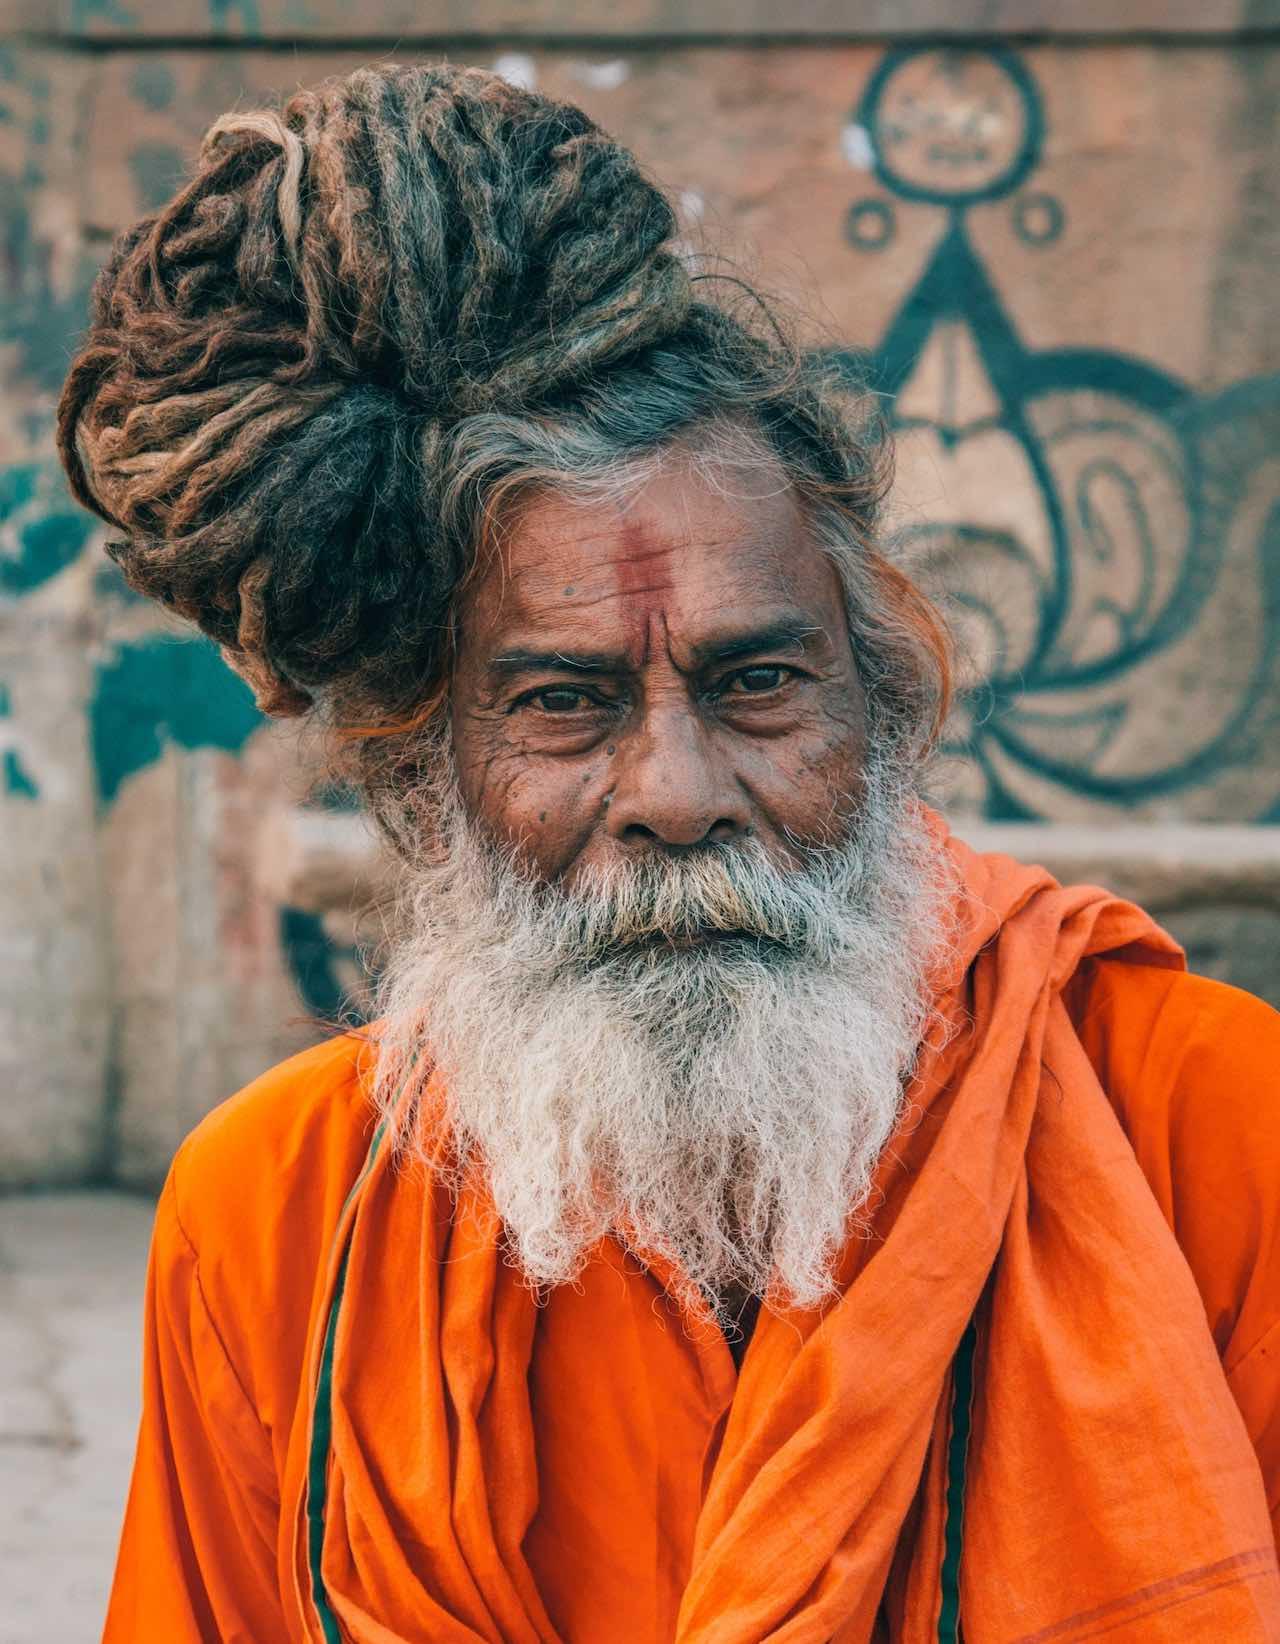 Monk Delhi India